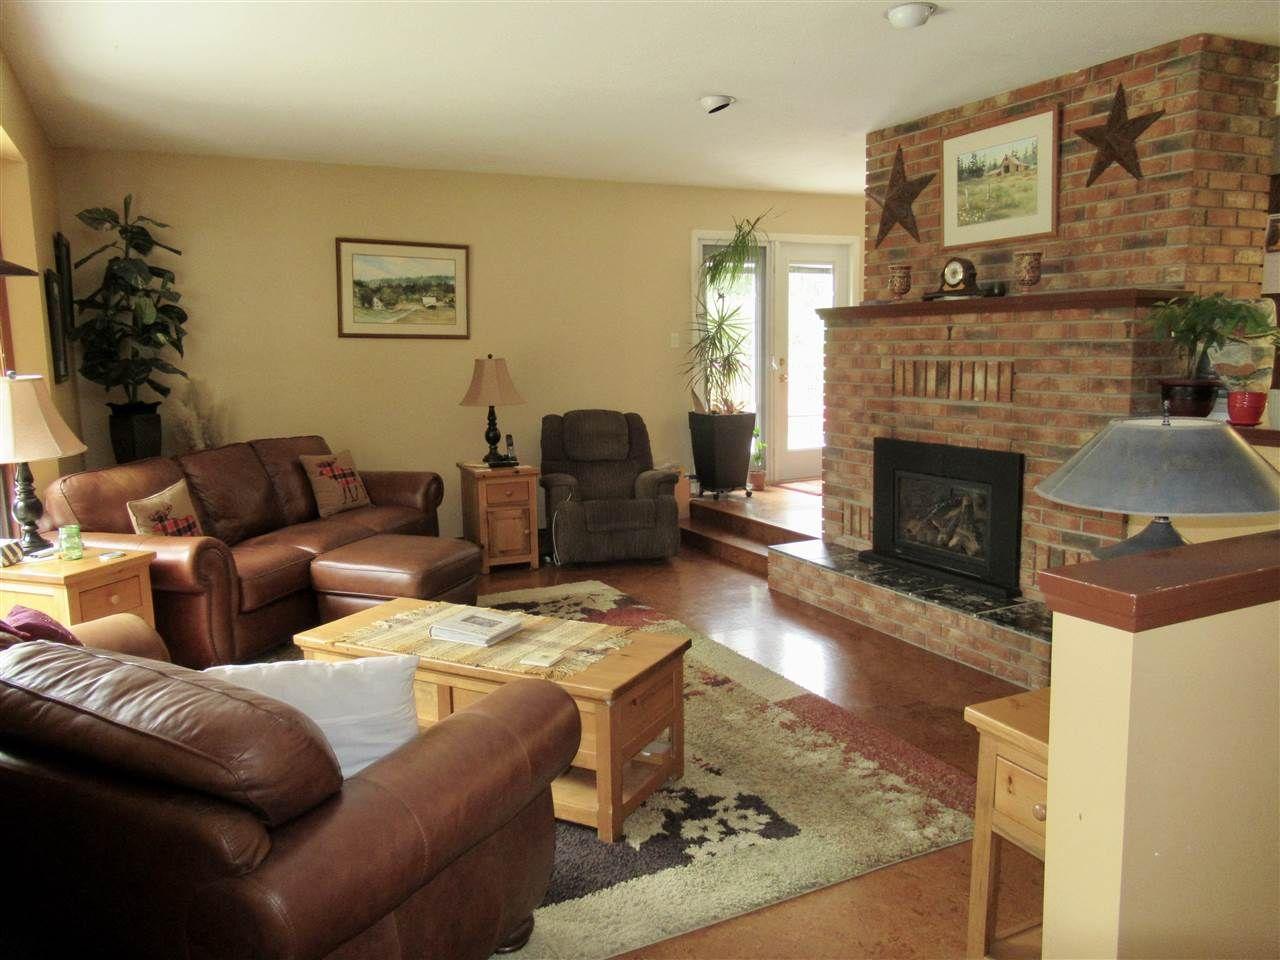 Photo 6: Photos: 911 CENTAUR Drive in Williams Lake: Esler/Dog Creek House for sale (Williams Lake (Zone 27))  : MLS®# R2378444